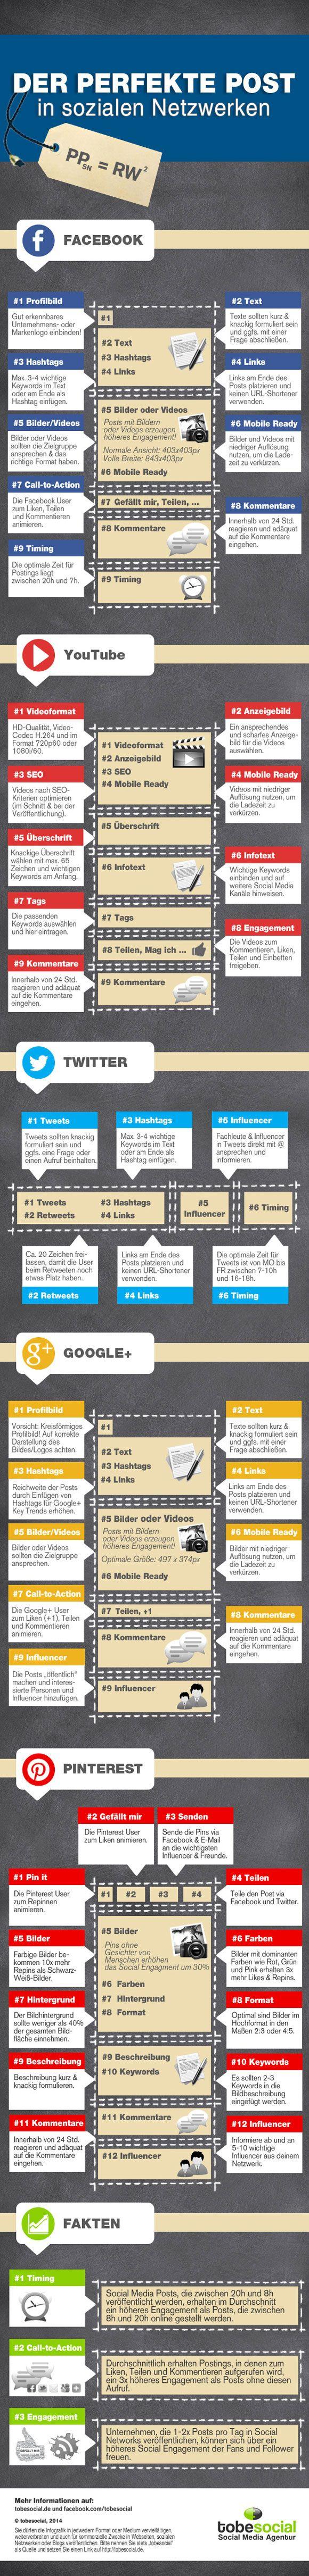 Aha ;-) So sieht er aus, der perfekte Post im Social Web via @deutsche-startups.de | #socialmedia #infographic